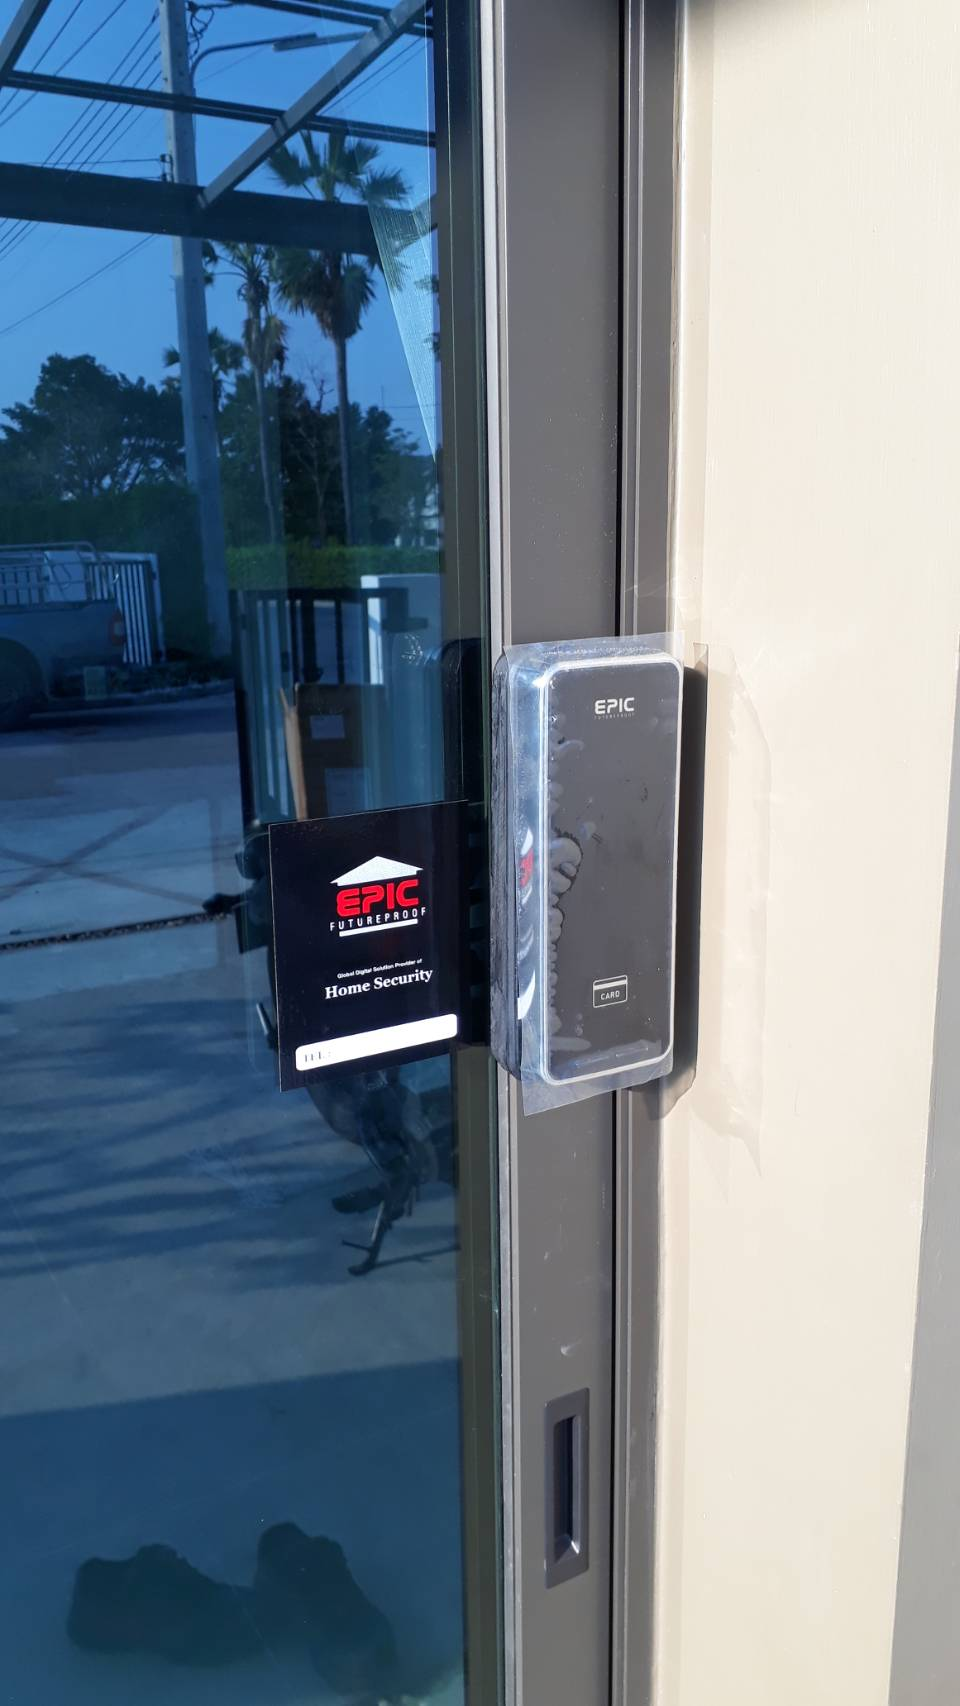 Digital door lock สำหรับประตูบานเลื่อนแบบล็อคริม ล็อคด้านข้าง ปิดชนด้านข้าง กรอบ อลูมิเนียม